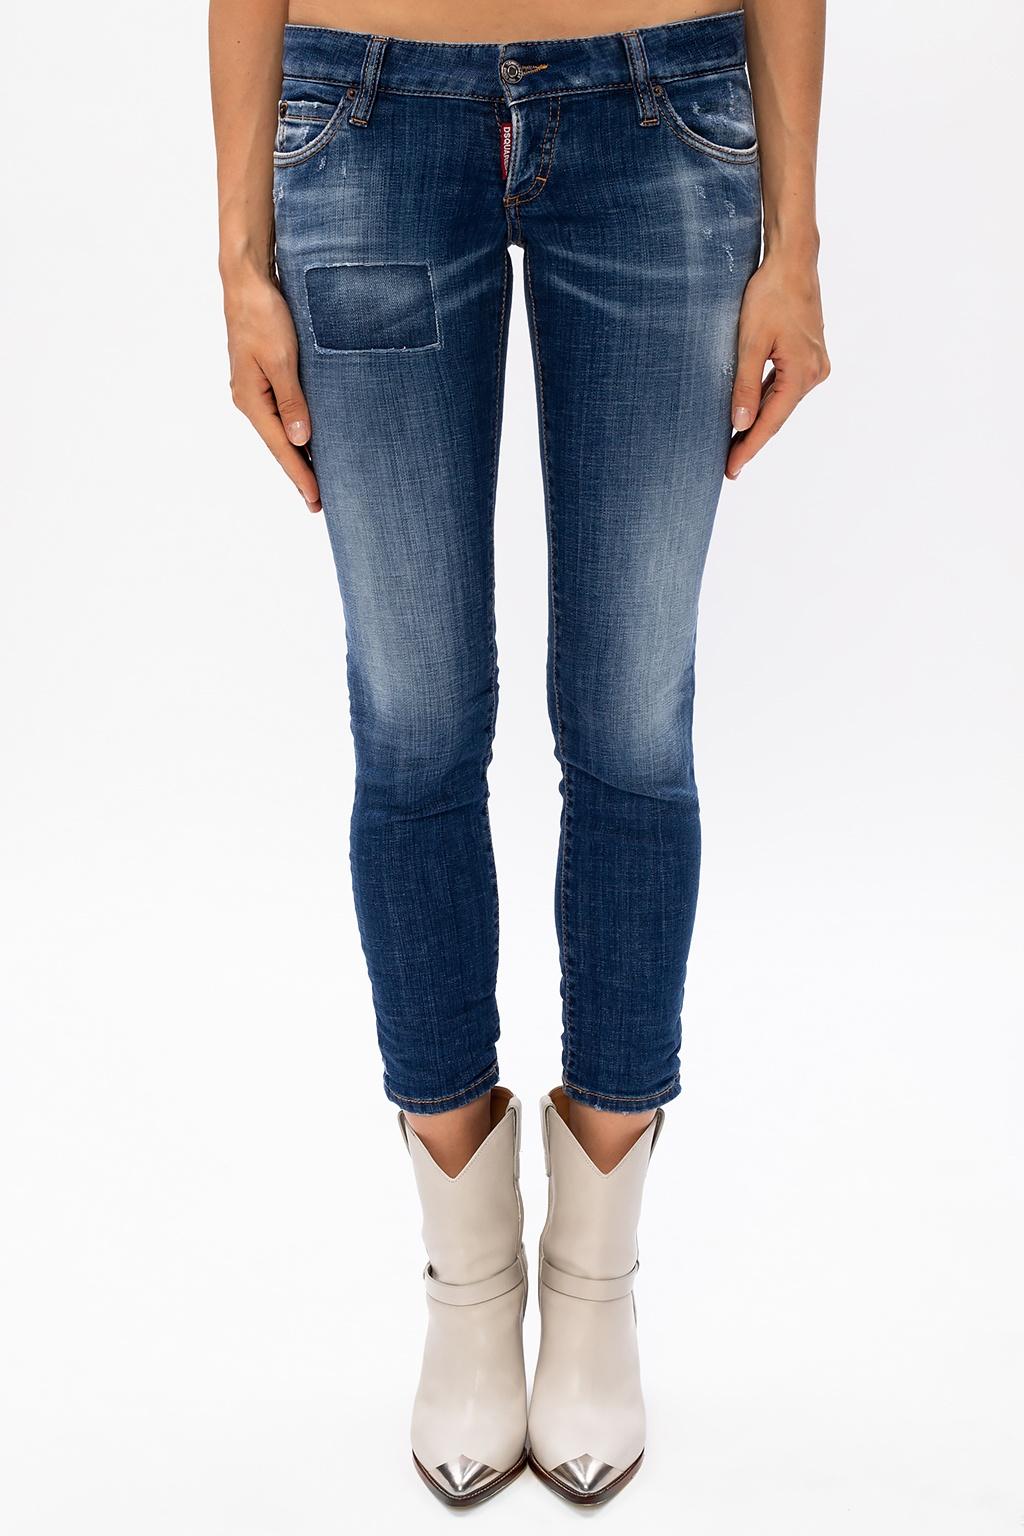 Dsquared2 'Pat Jean' jeans